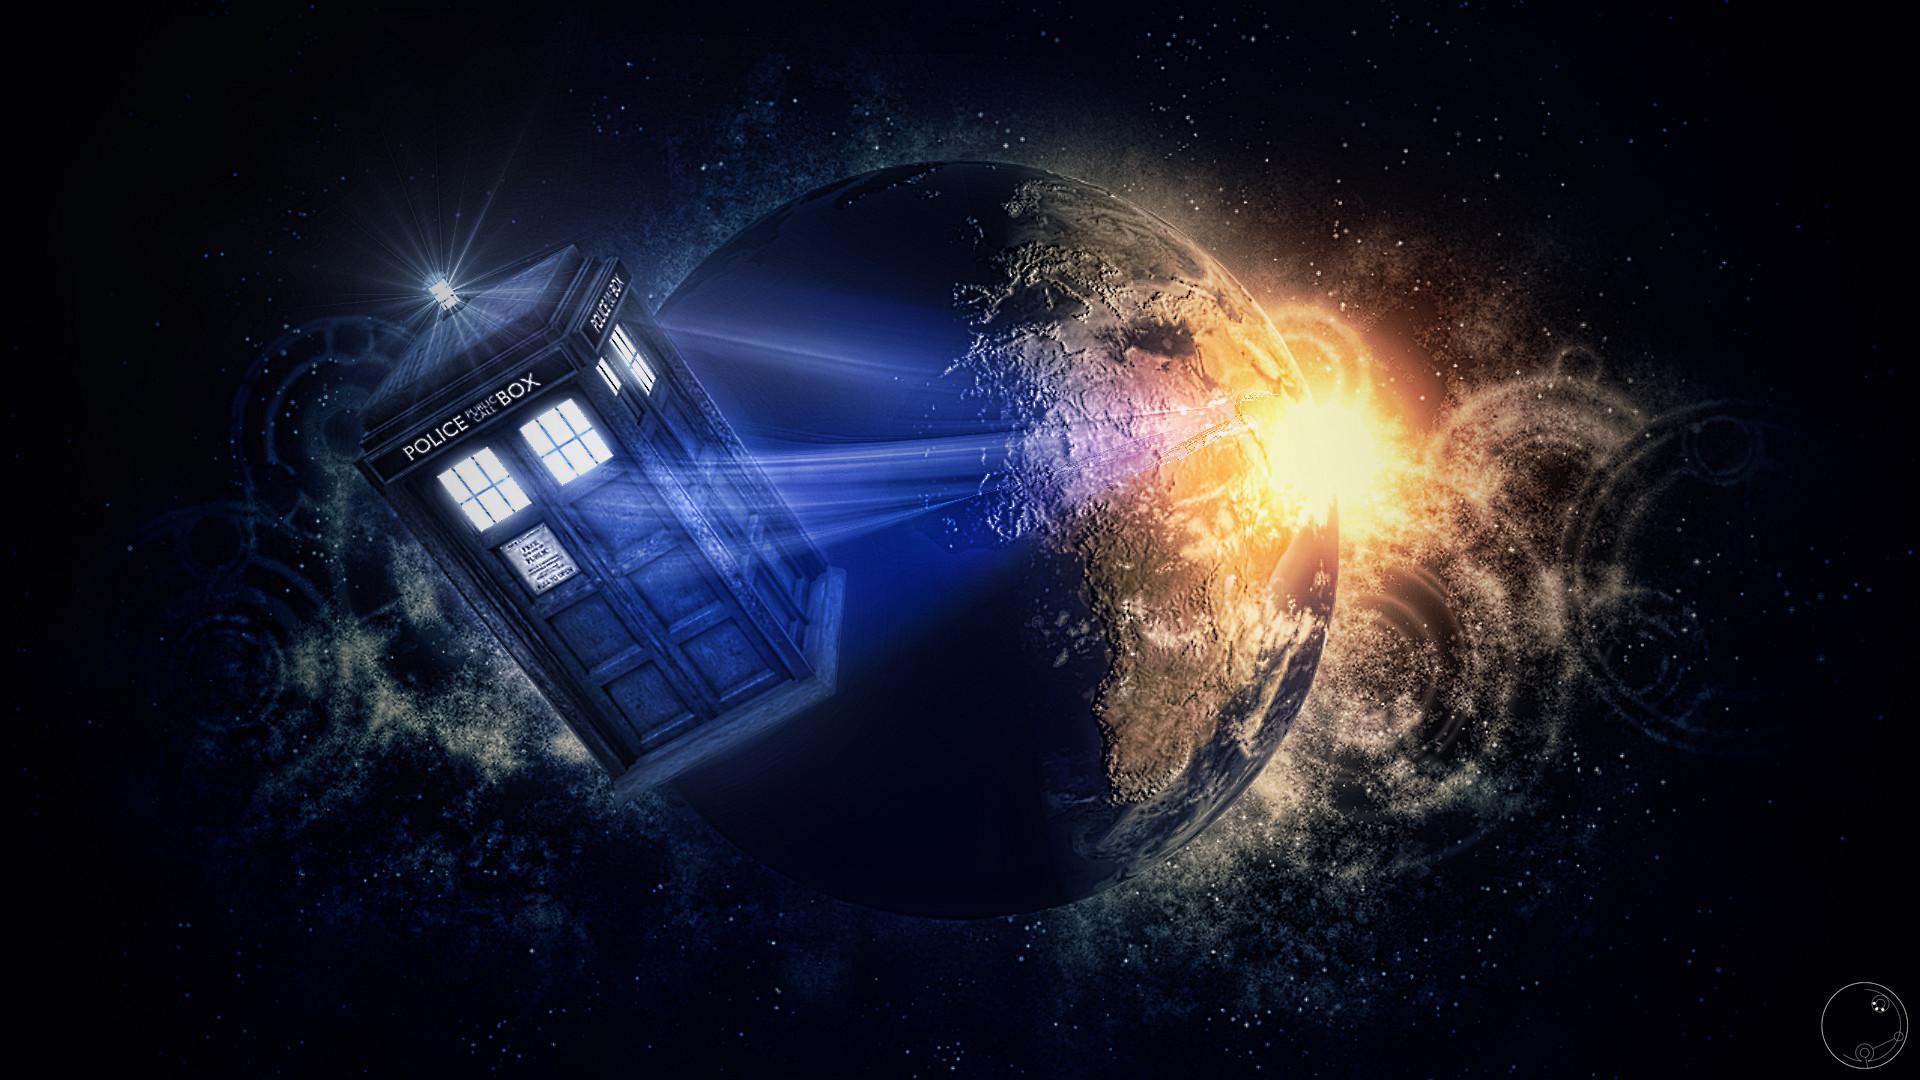 Doctor Who Desktop Wallpaper ·① WallpaperTag